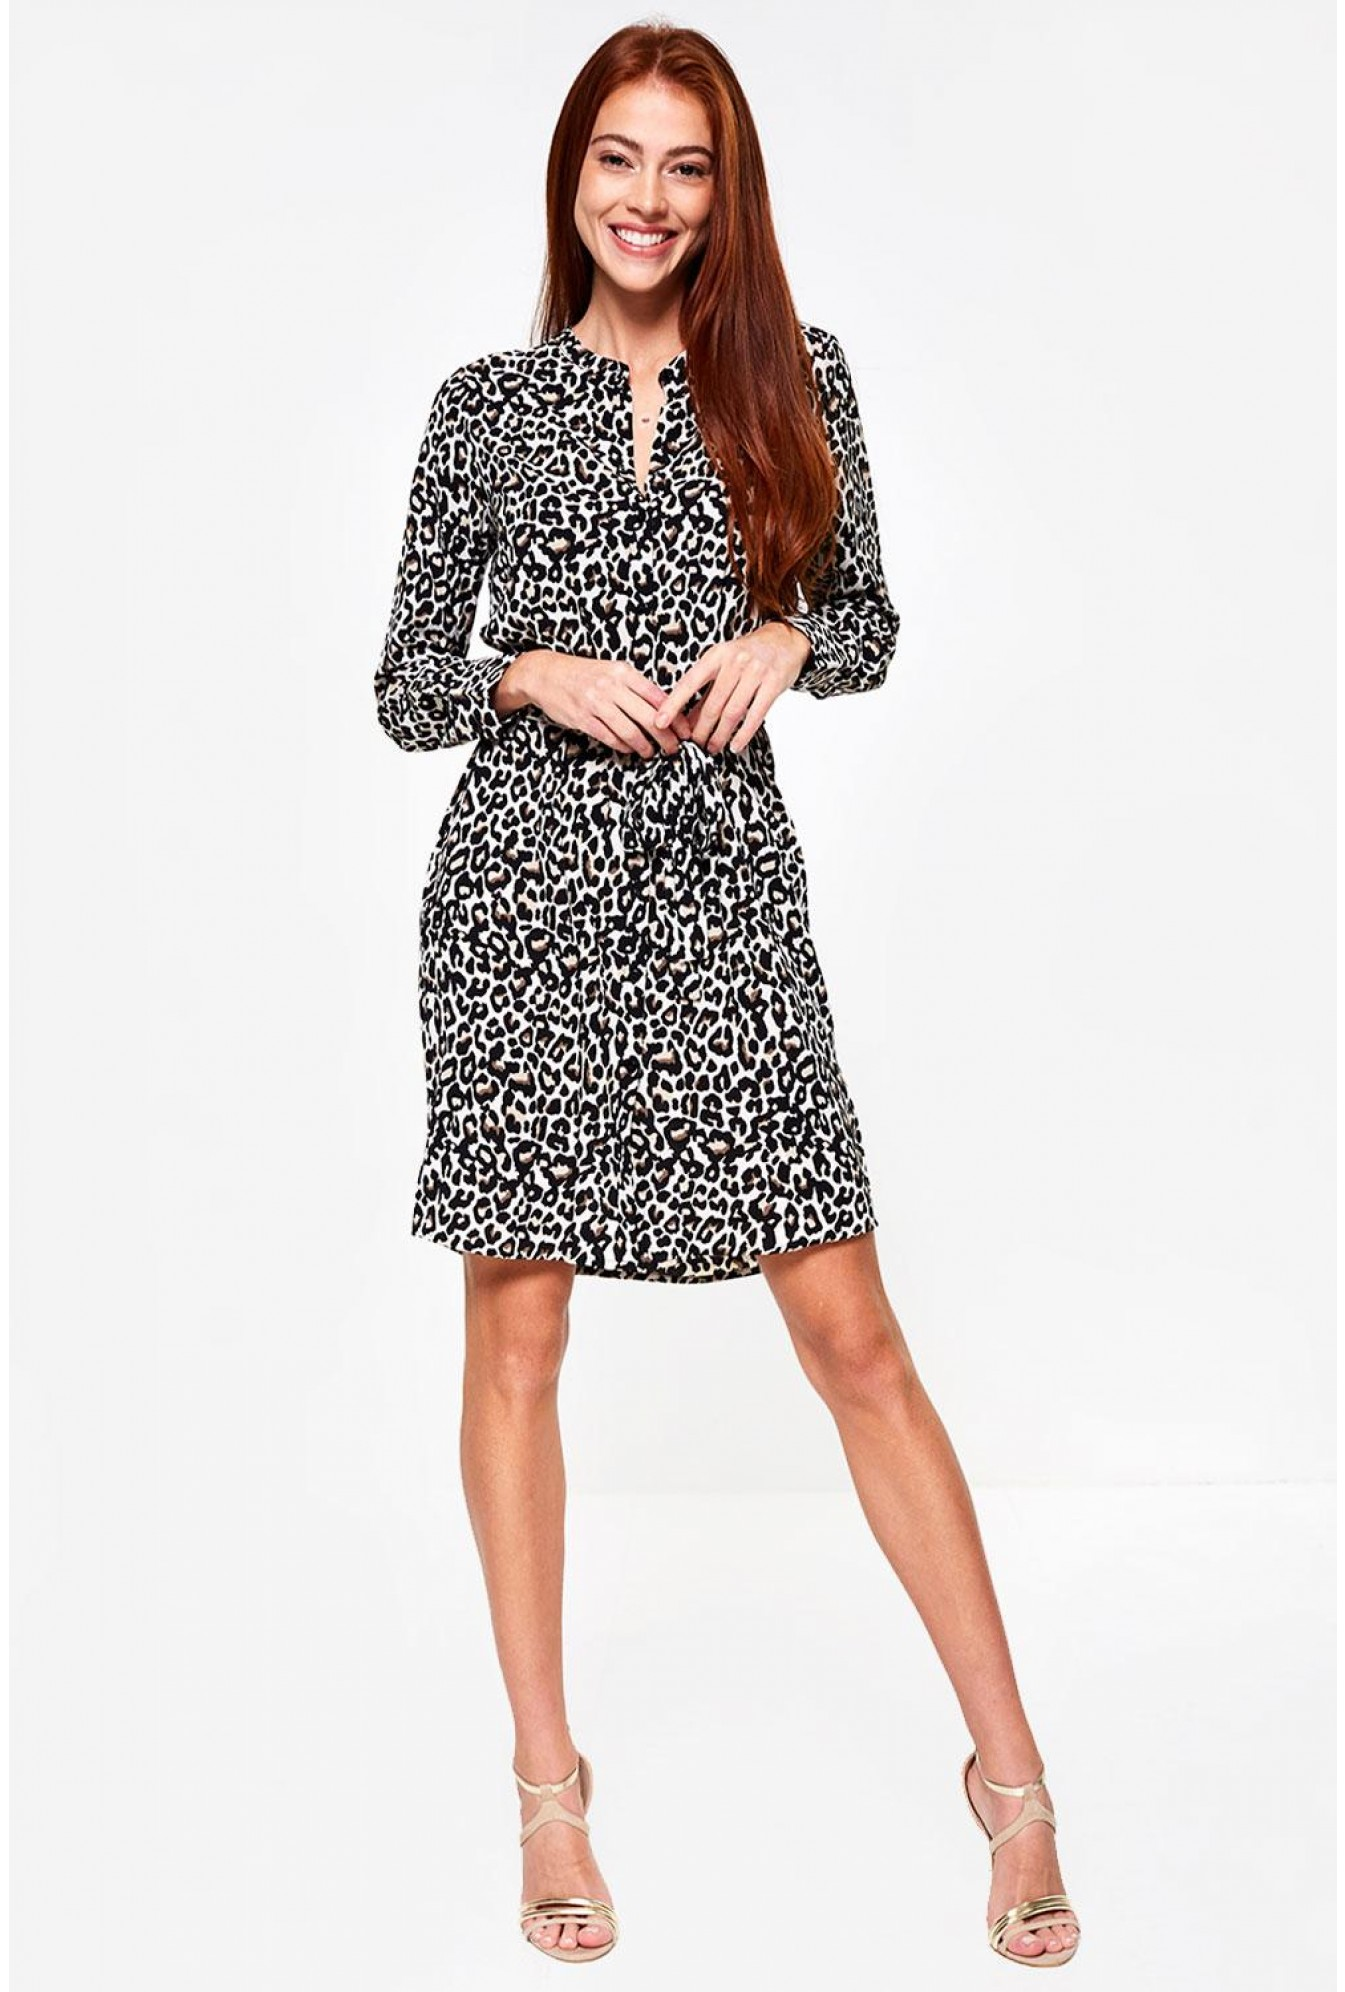 dc1f02f781e1 Vero Moda Saga Shirt Dress in Animal Print   iCLOTHING